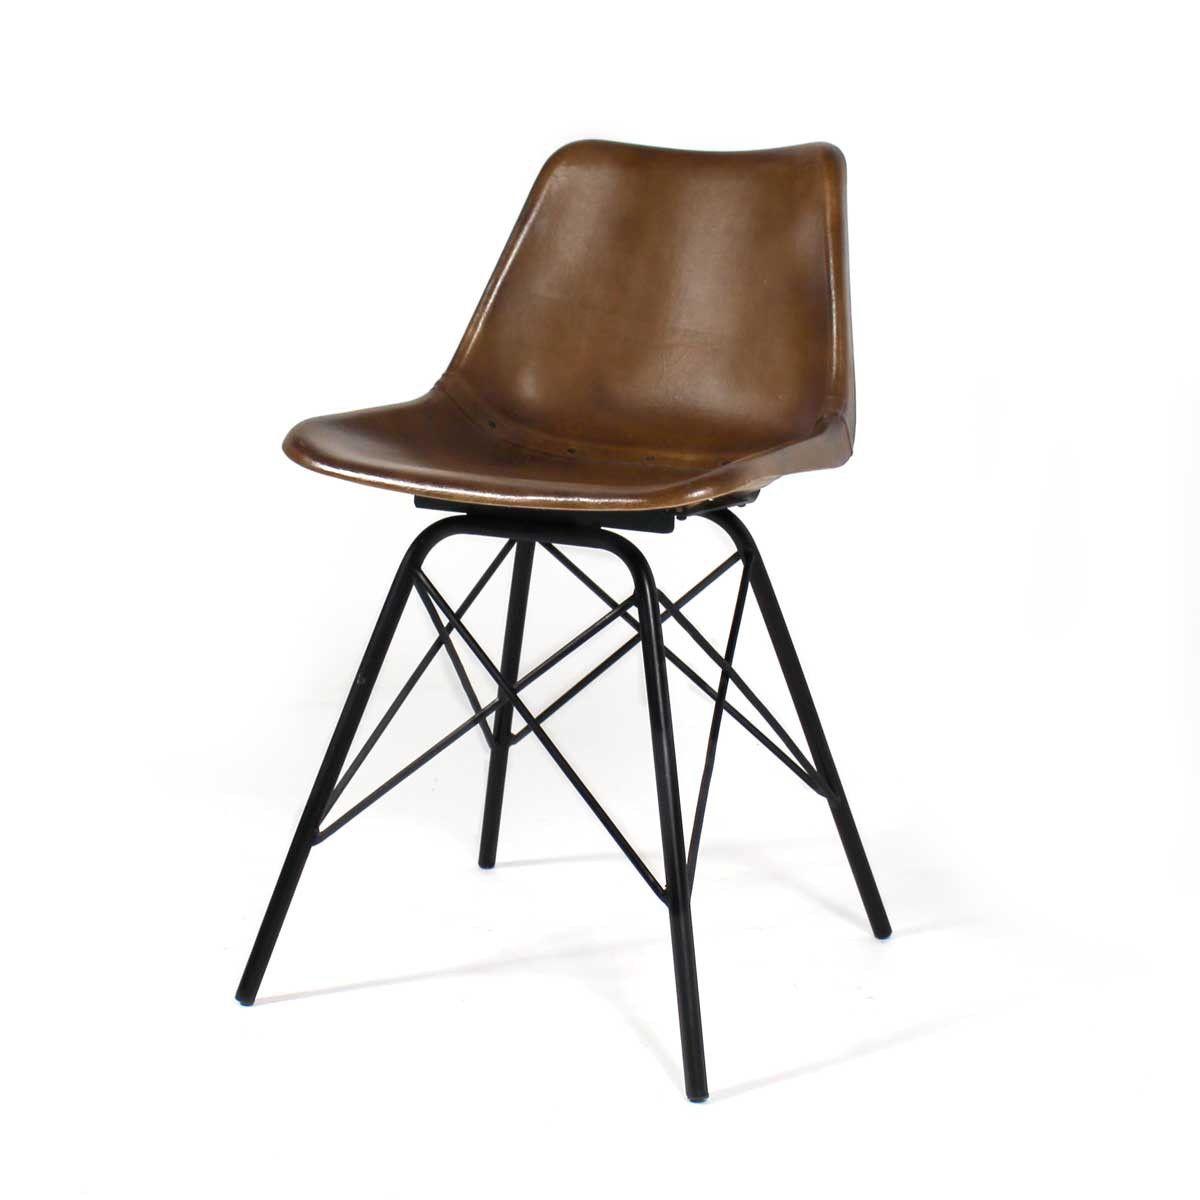 Chaise Industrielle Cuir Pieds Tour Eiffel Chaise Industrielle Chaise De Salle A Manger Chaise Cuir